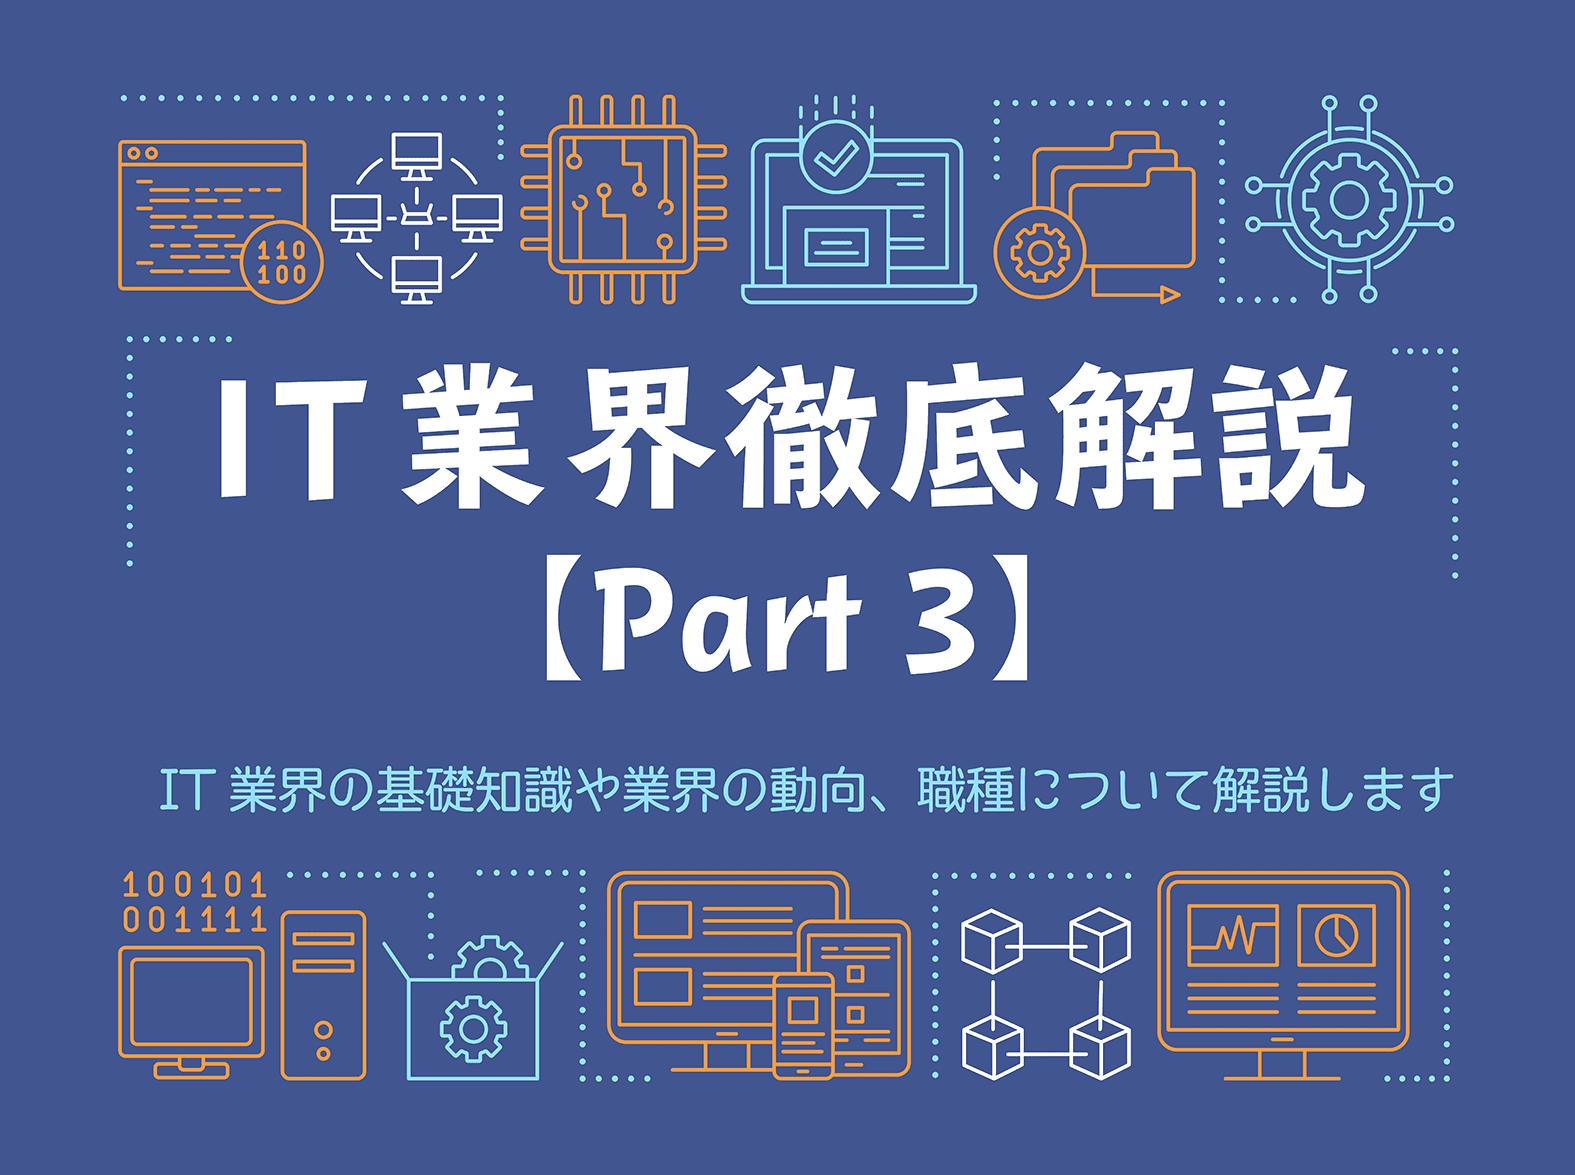 【IT業界徹底解説Part3】IT業界の変遷と今後の動向